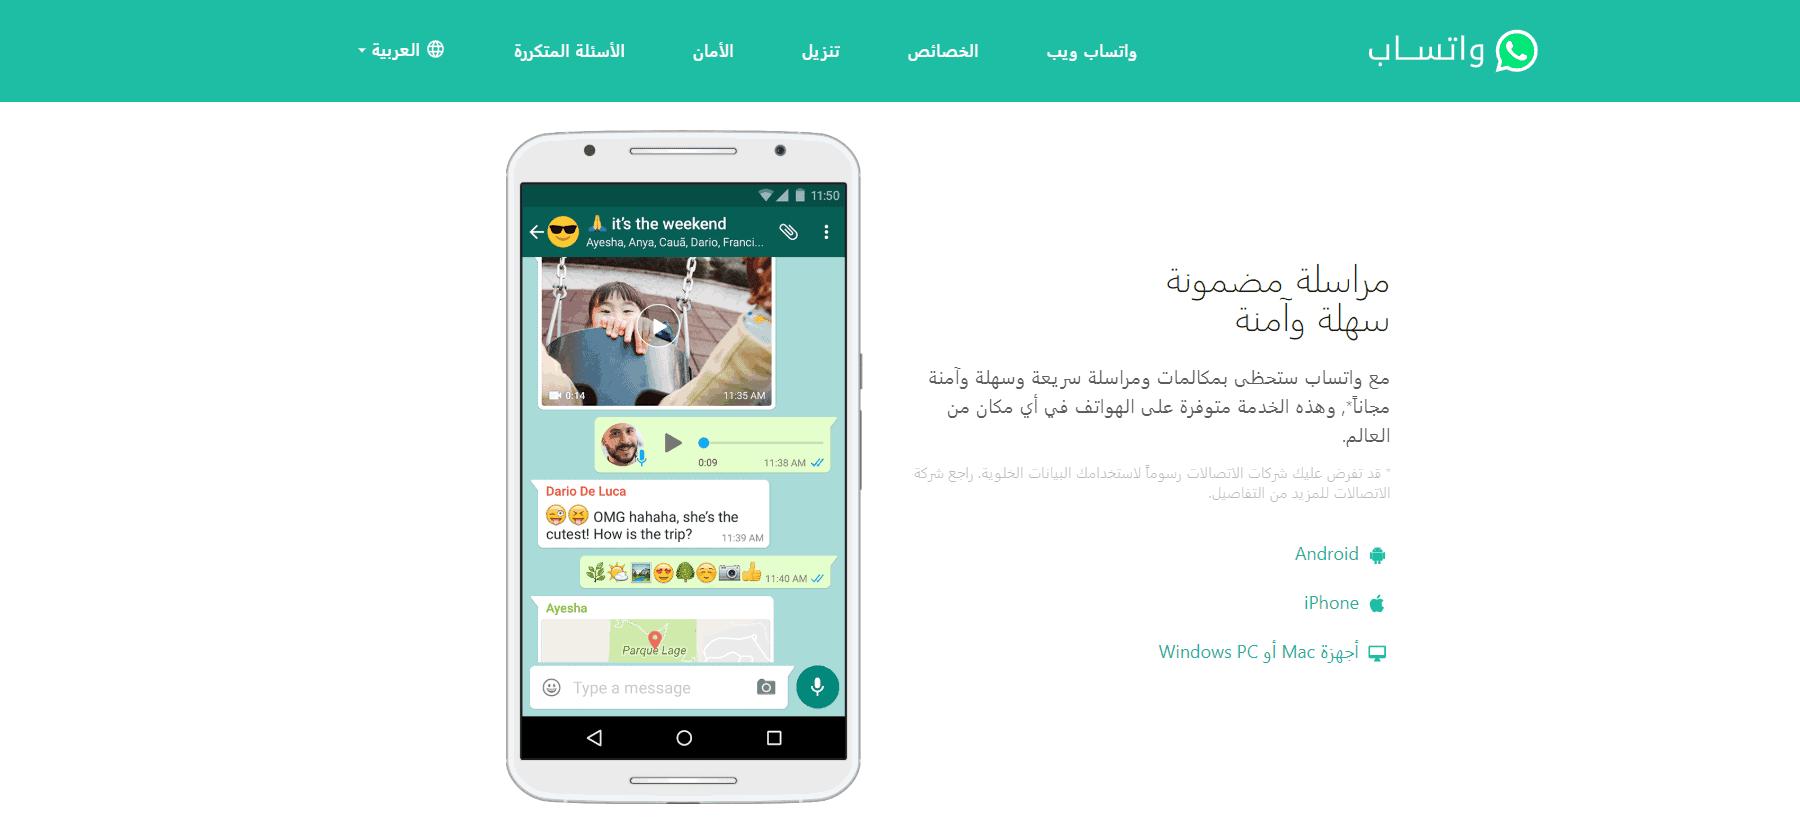 تنزيل واتساب مجاني أحدث إصدار WhatsApp Messenger Free